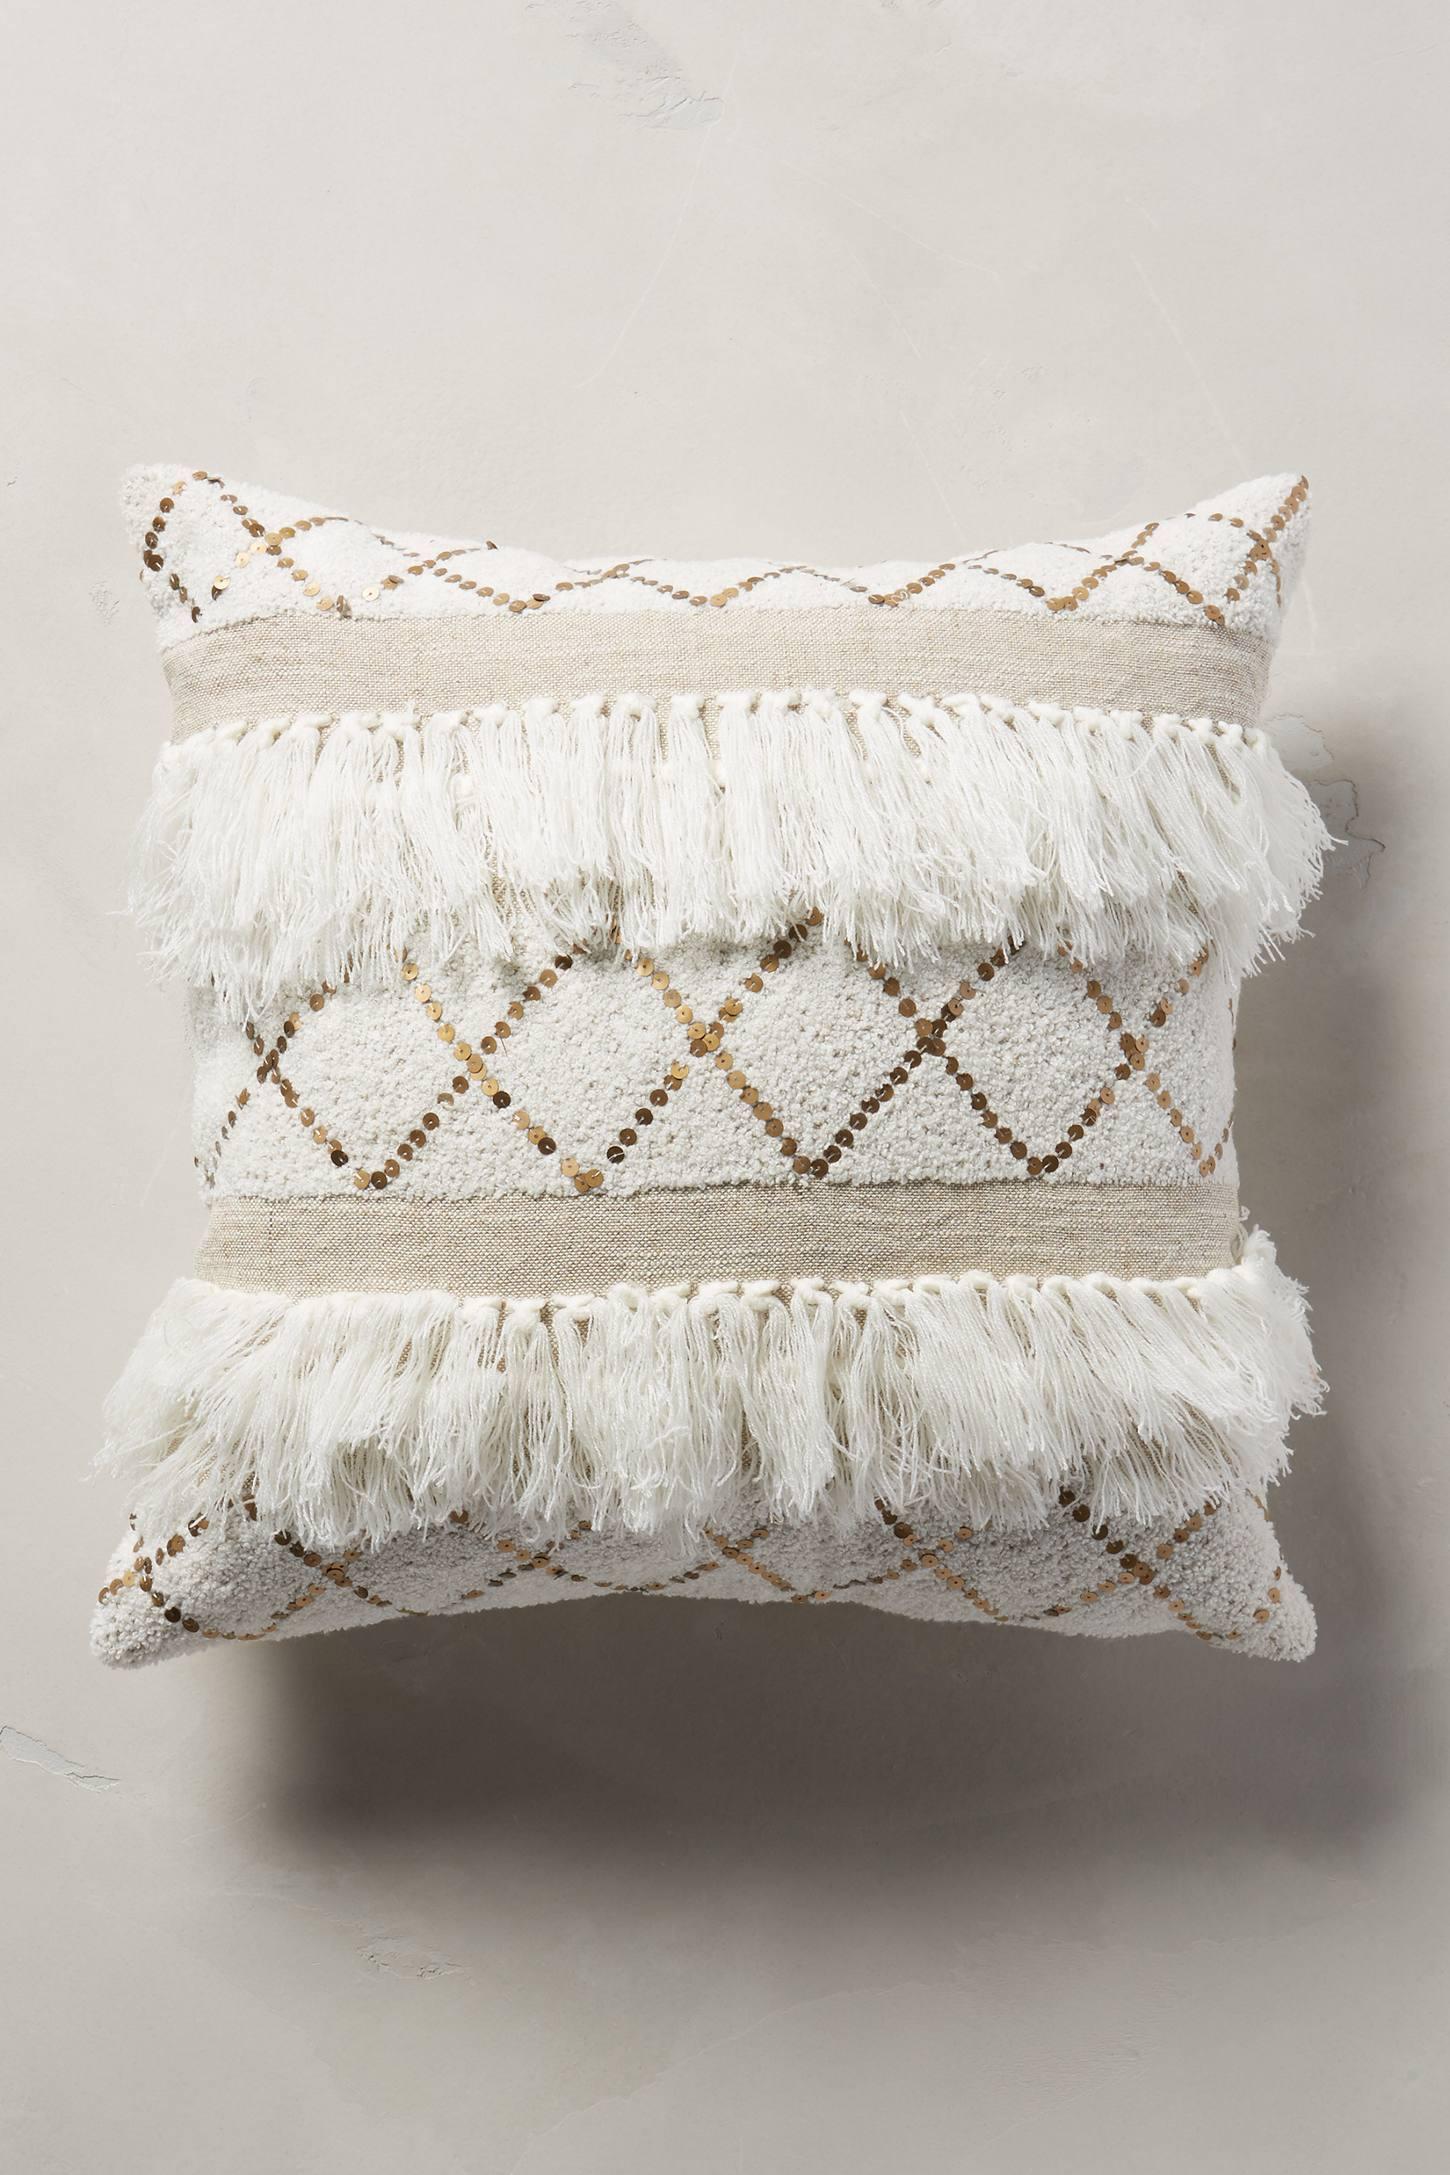 Throw Pillows Luxury : Like Anthropologie Morocco style cushion - BUYMA